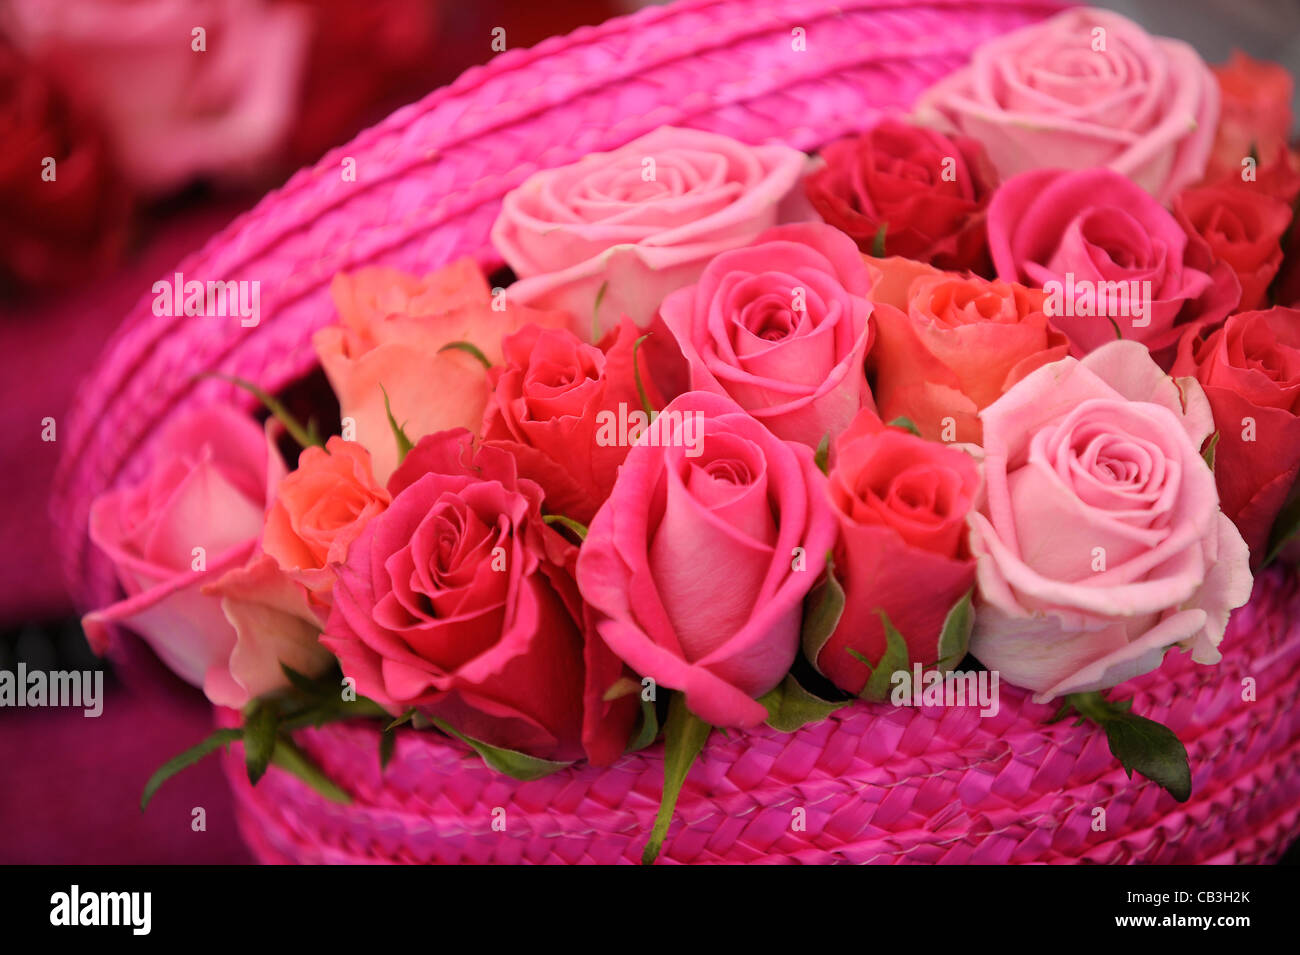 Red Roses In Basket Imágenes De Stock & Red Roses In Basket Fotos De ...